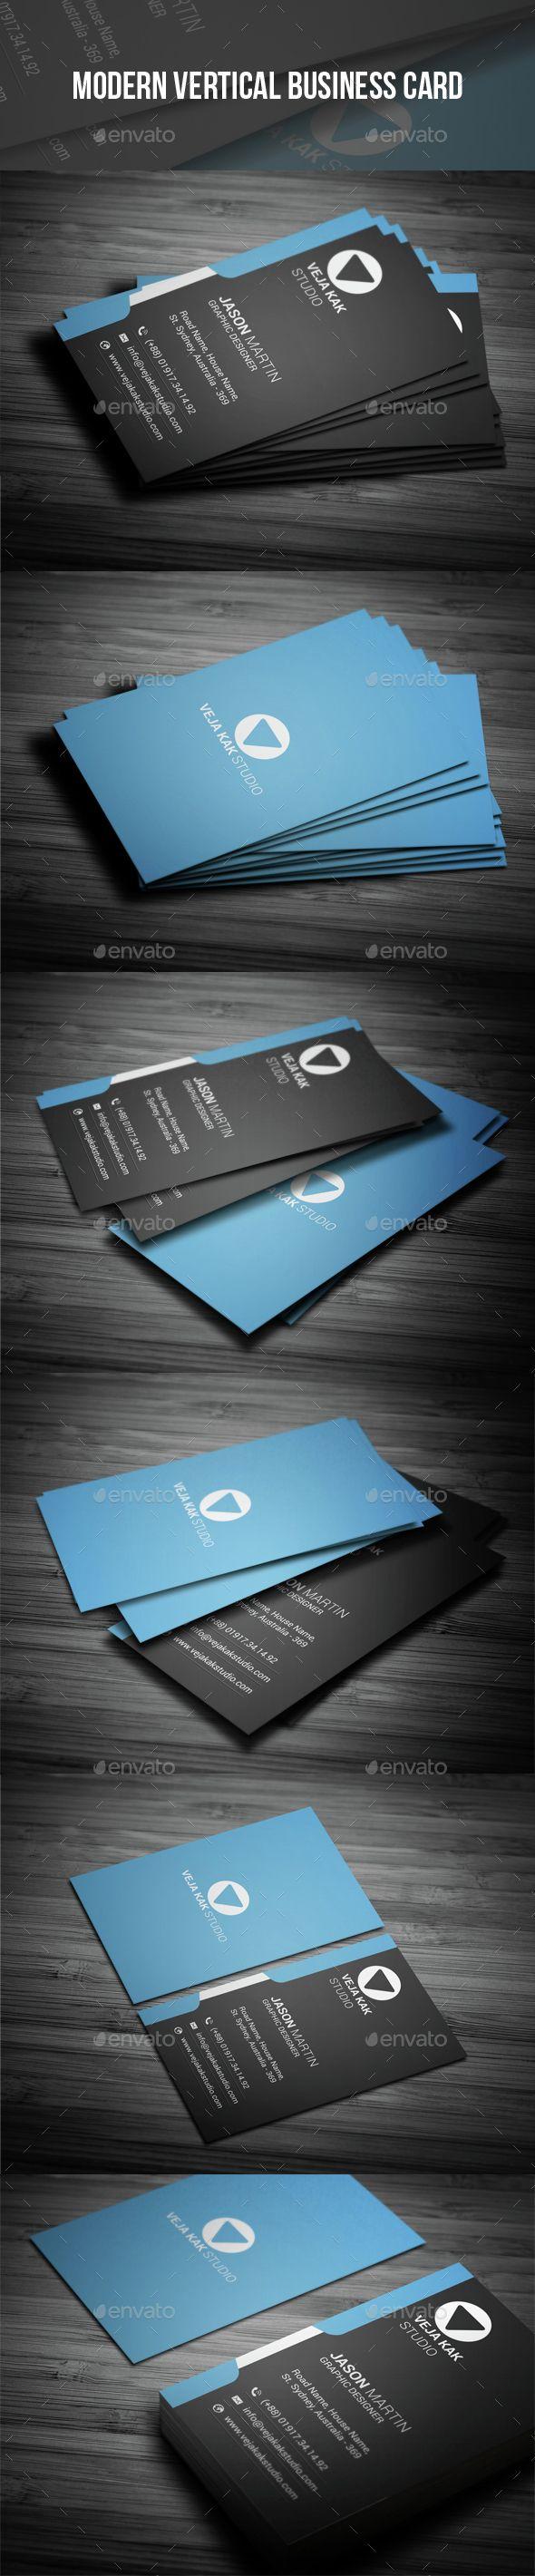 Modern Vertical Business Card Template PSD. Download here: http://graphicriver.net/item/modern-vertical-business-card/14954791?ref=ksioks